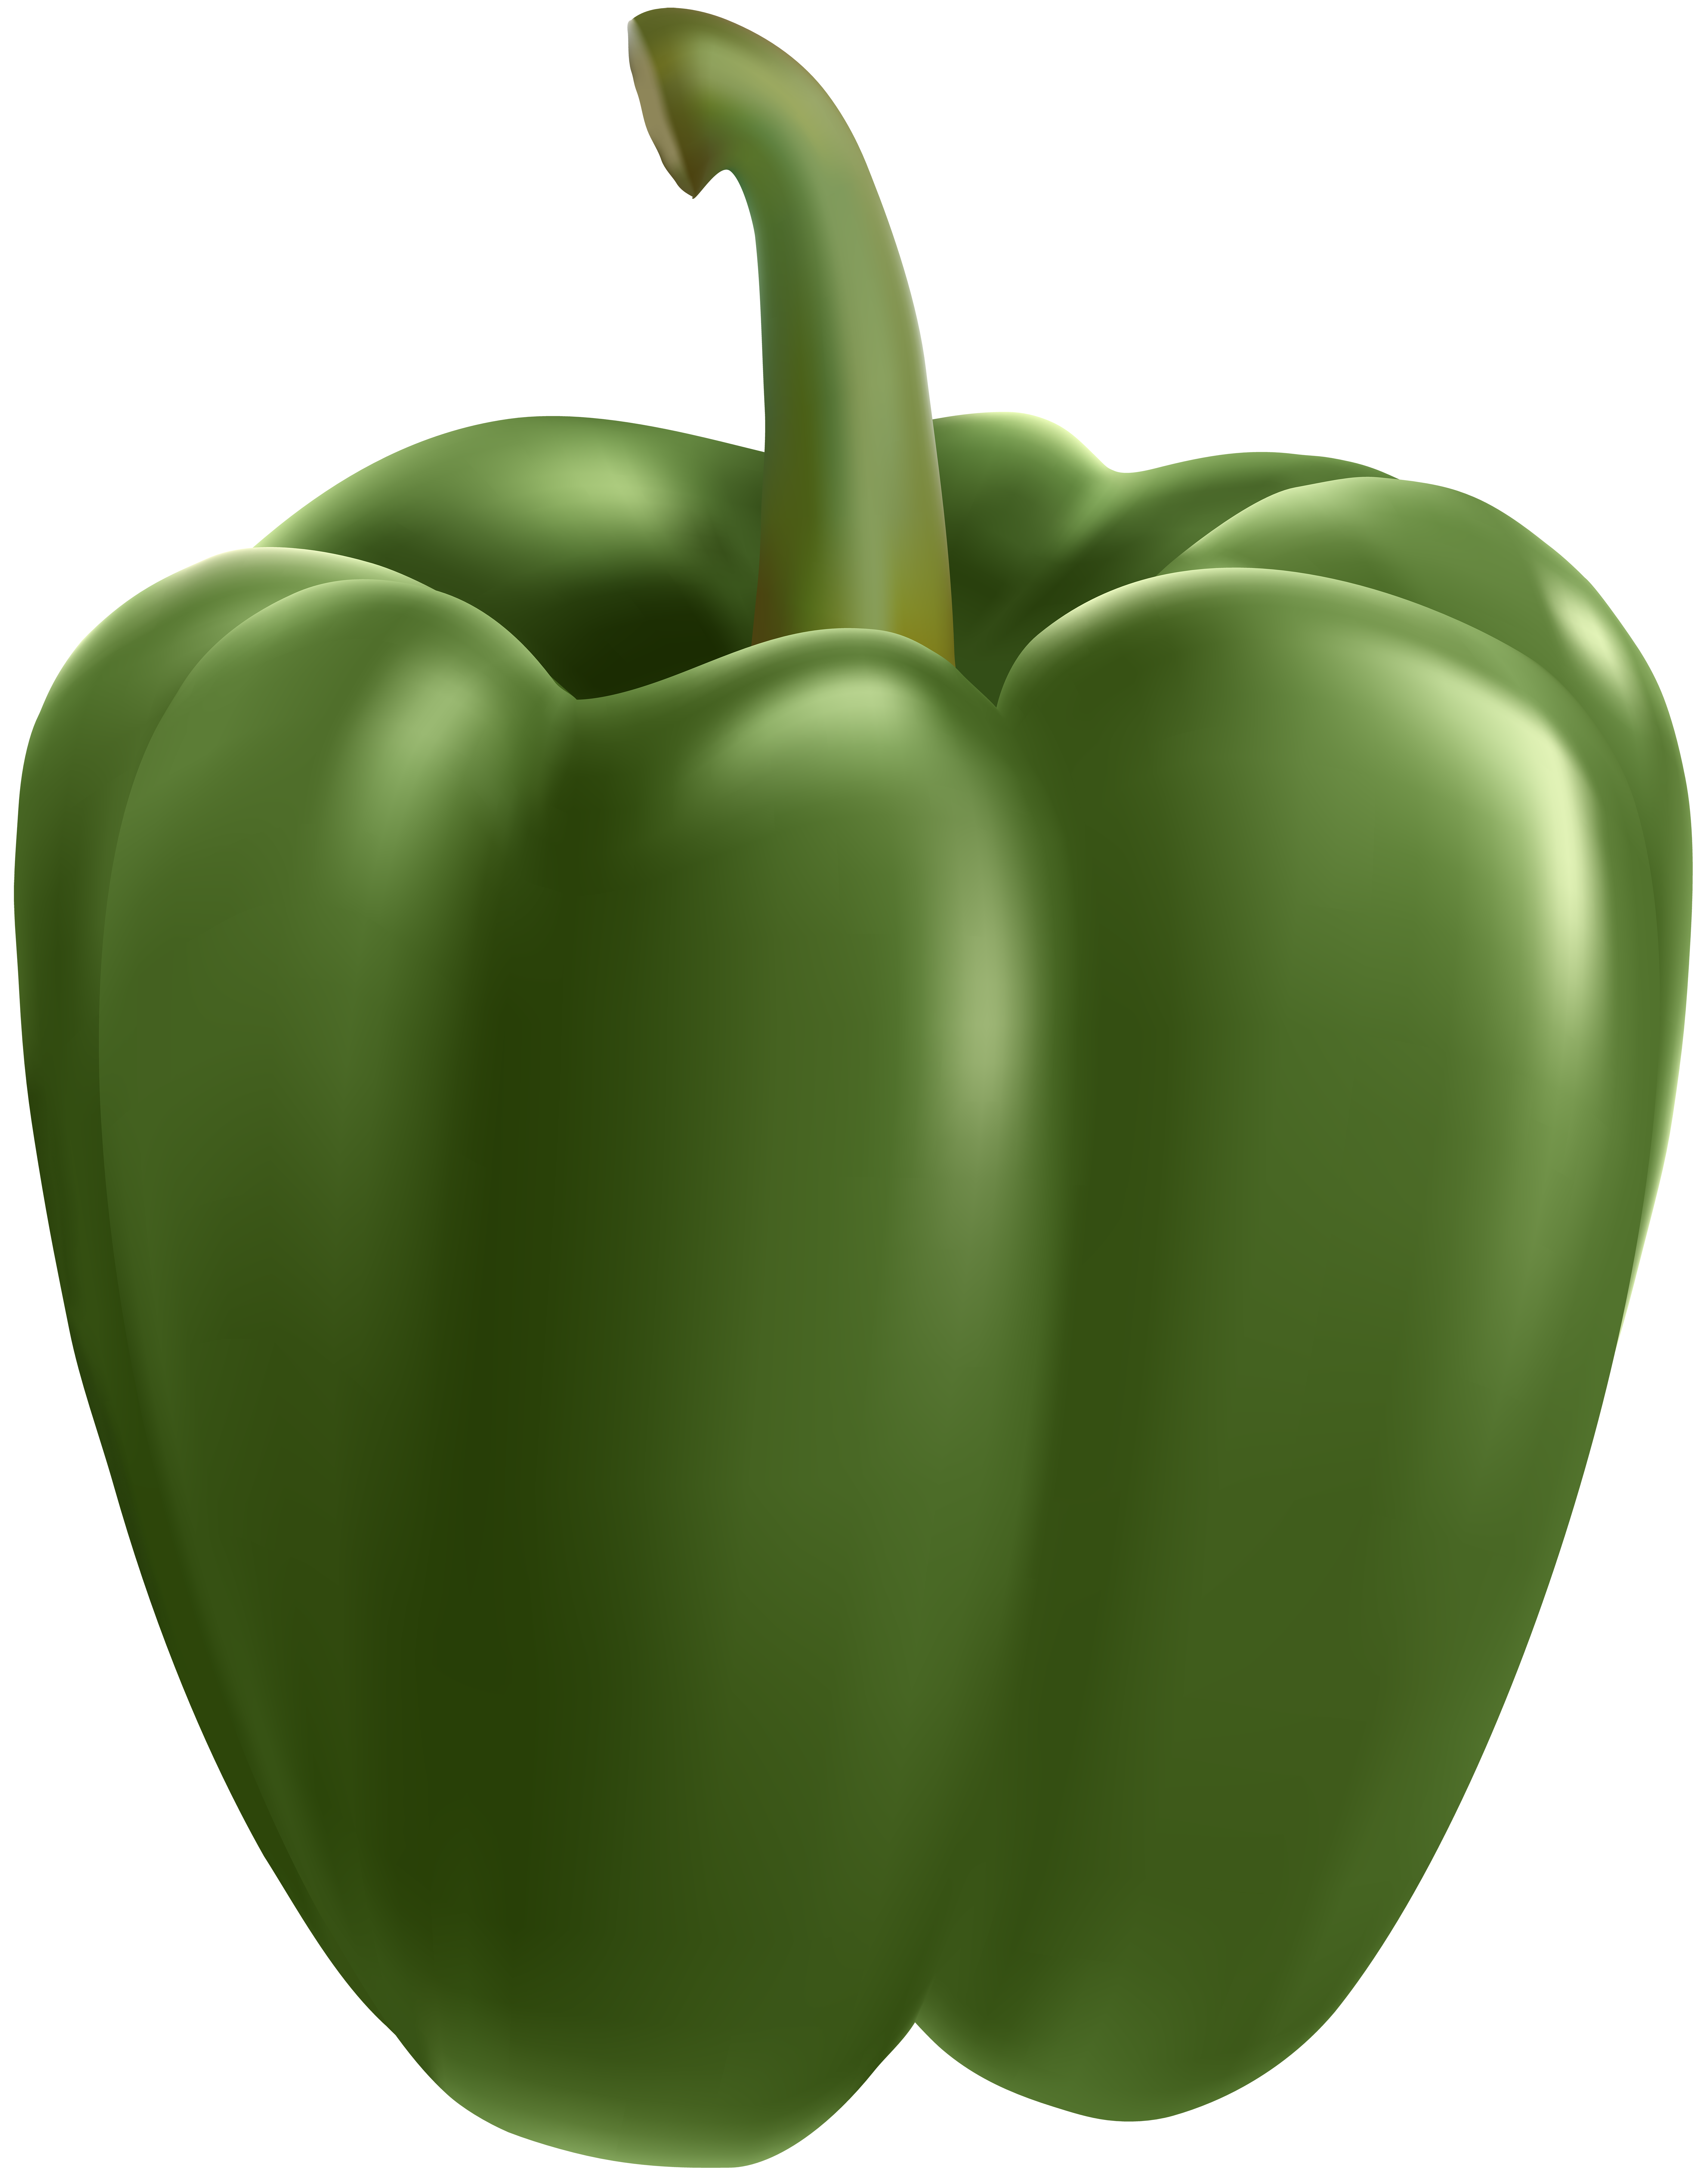 Bell pepper transparent clip. Peppers clipart green vegetable